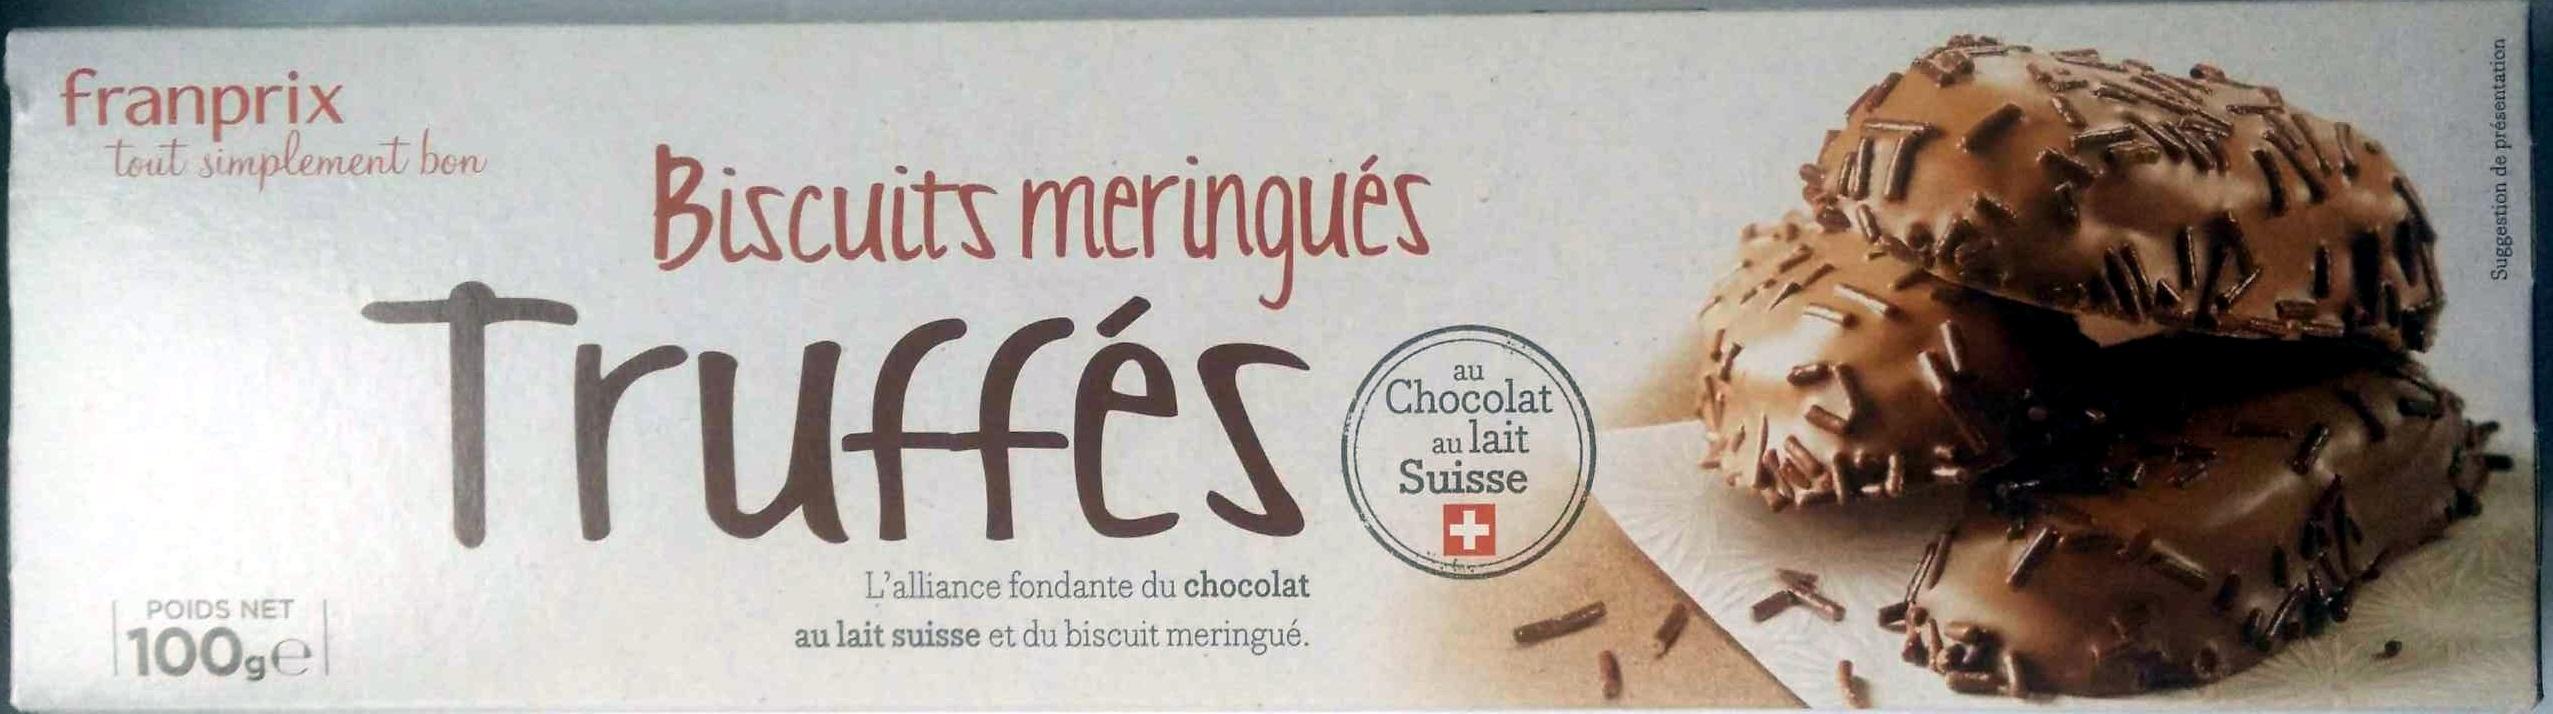 Biscuits Meringués Truffés - Product